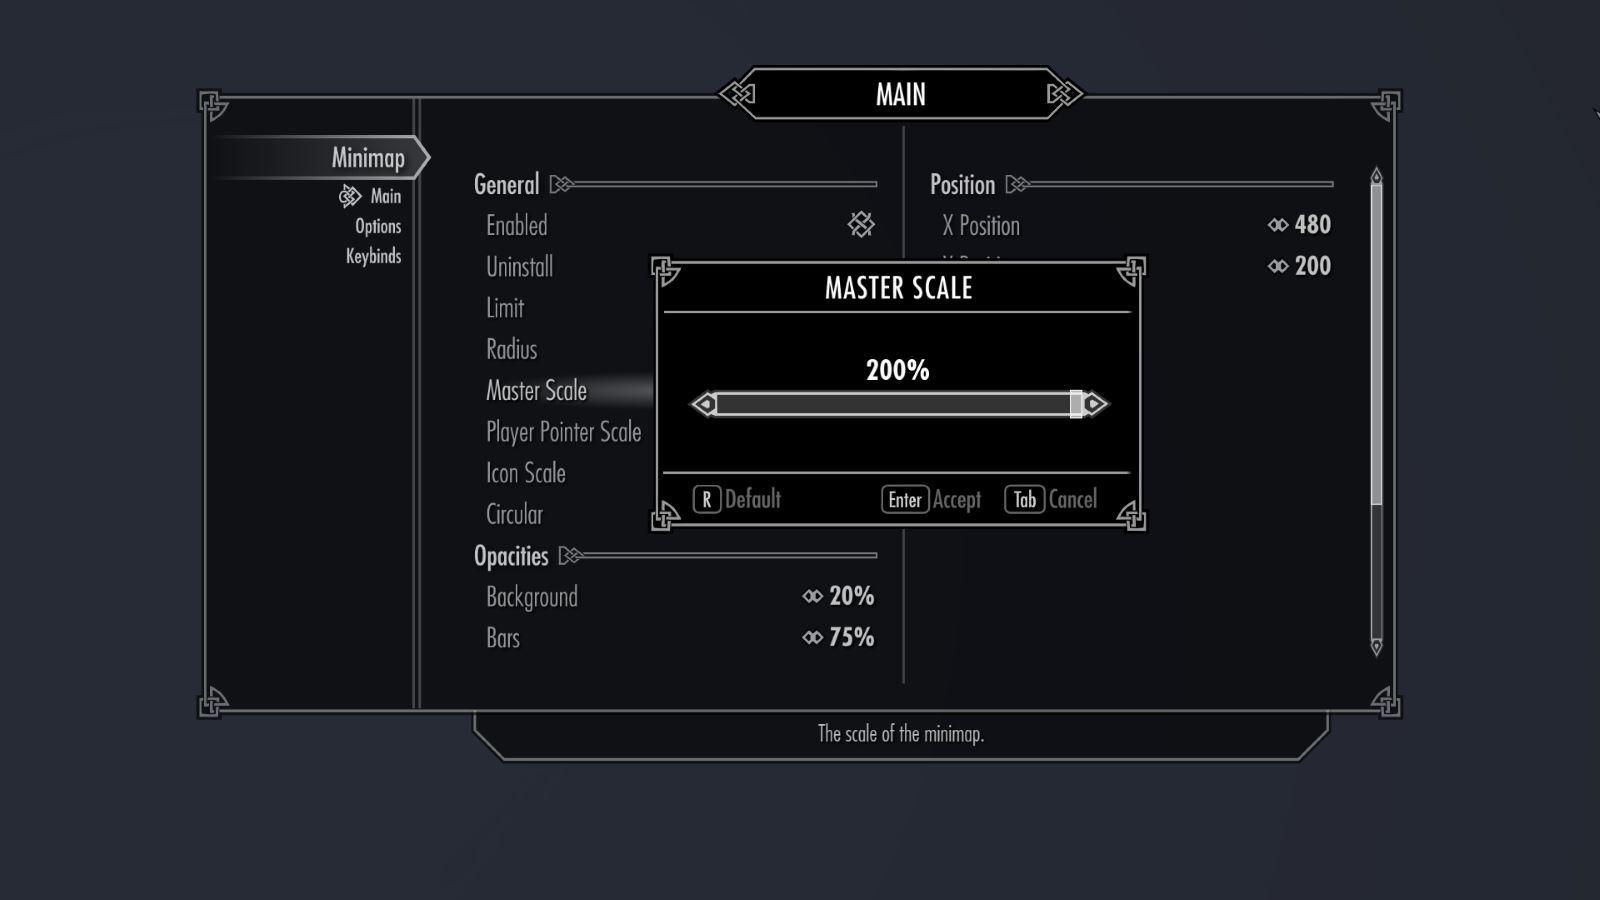 SkyrimMinimapSK 133-1 Info MasterScale 1